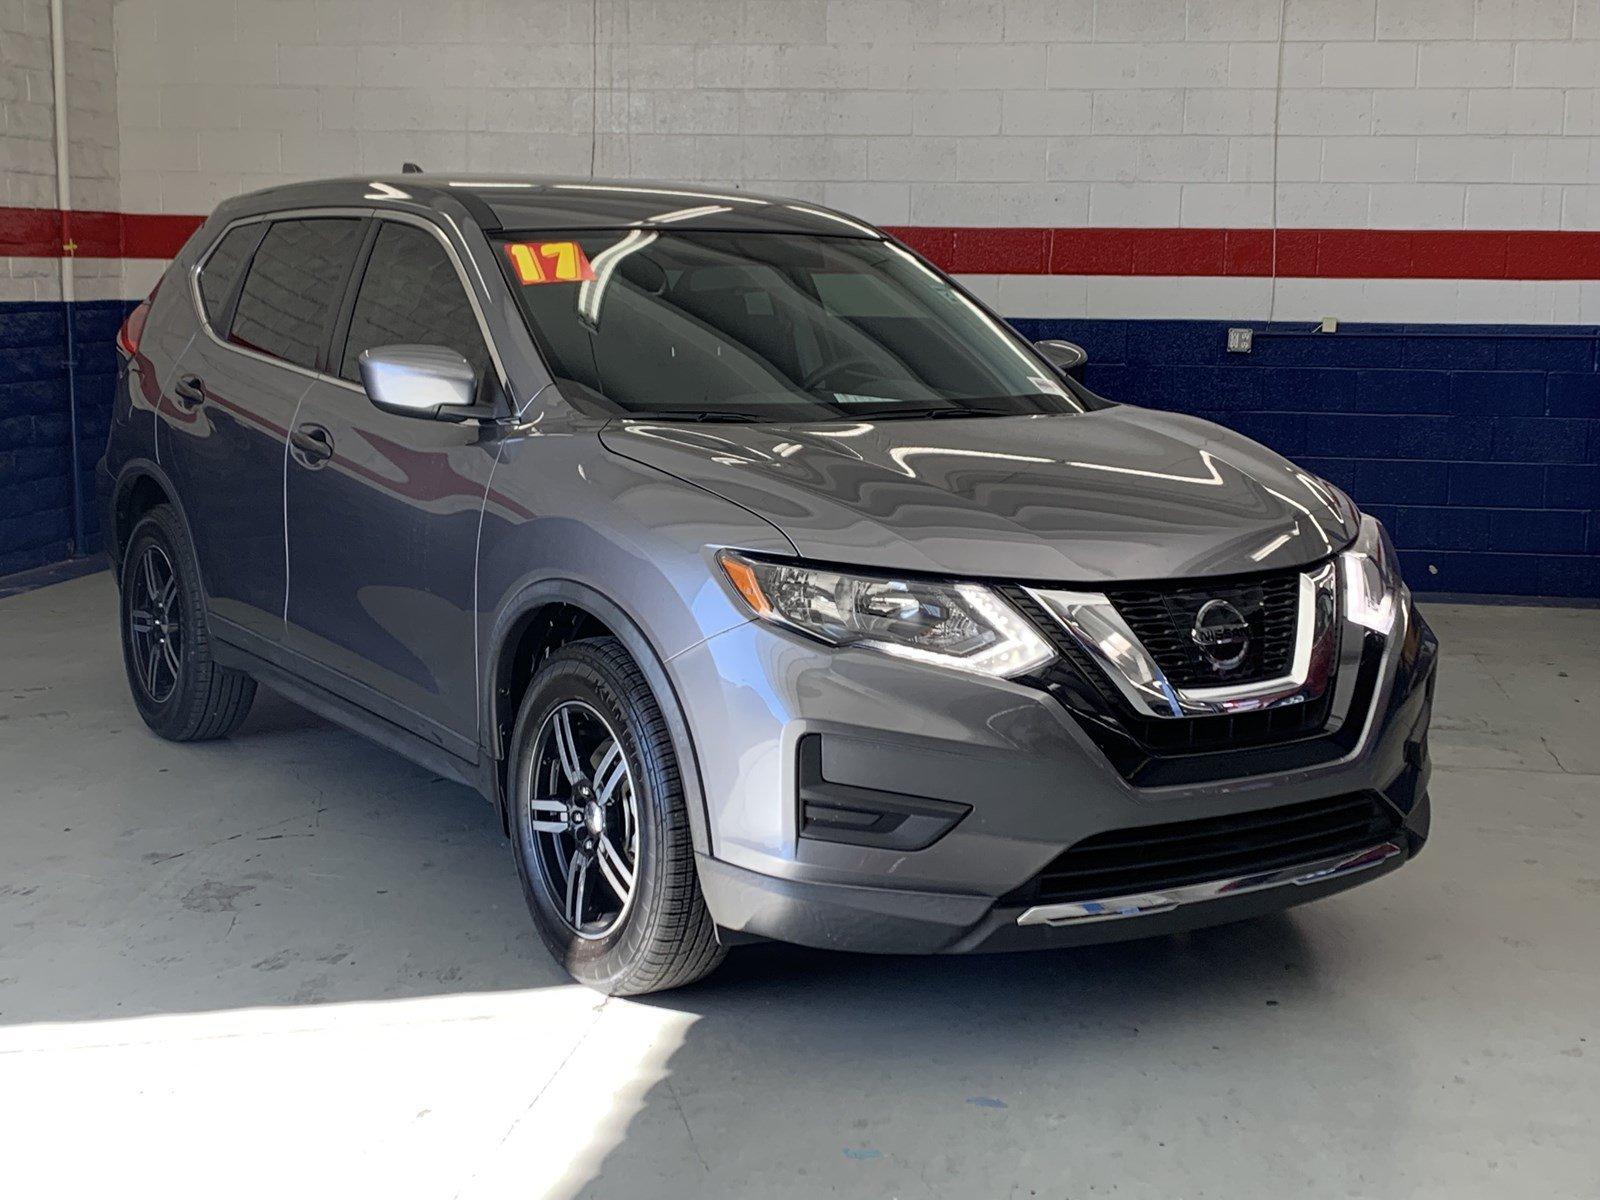 2017 Nissan Rogue S in Las Vegas, NV